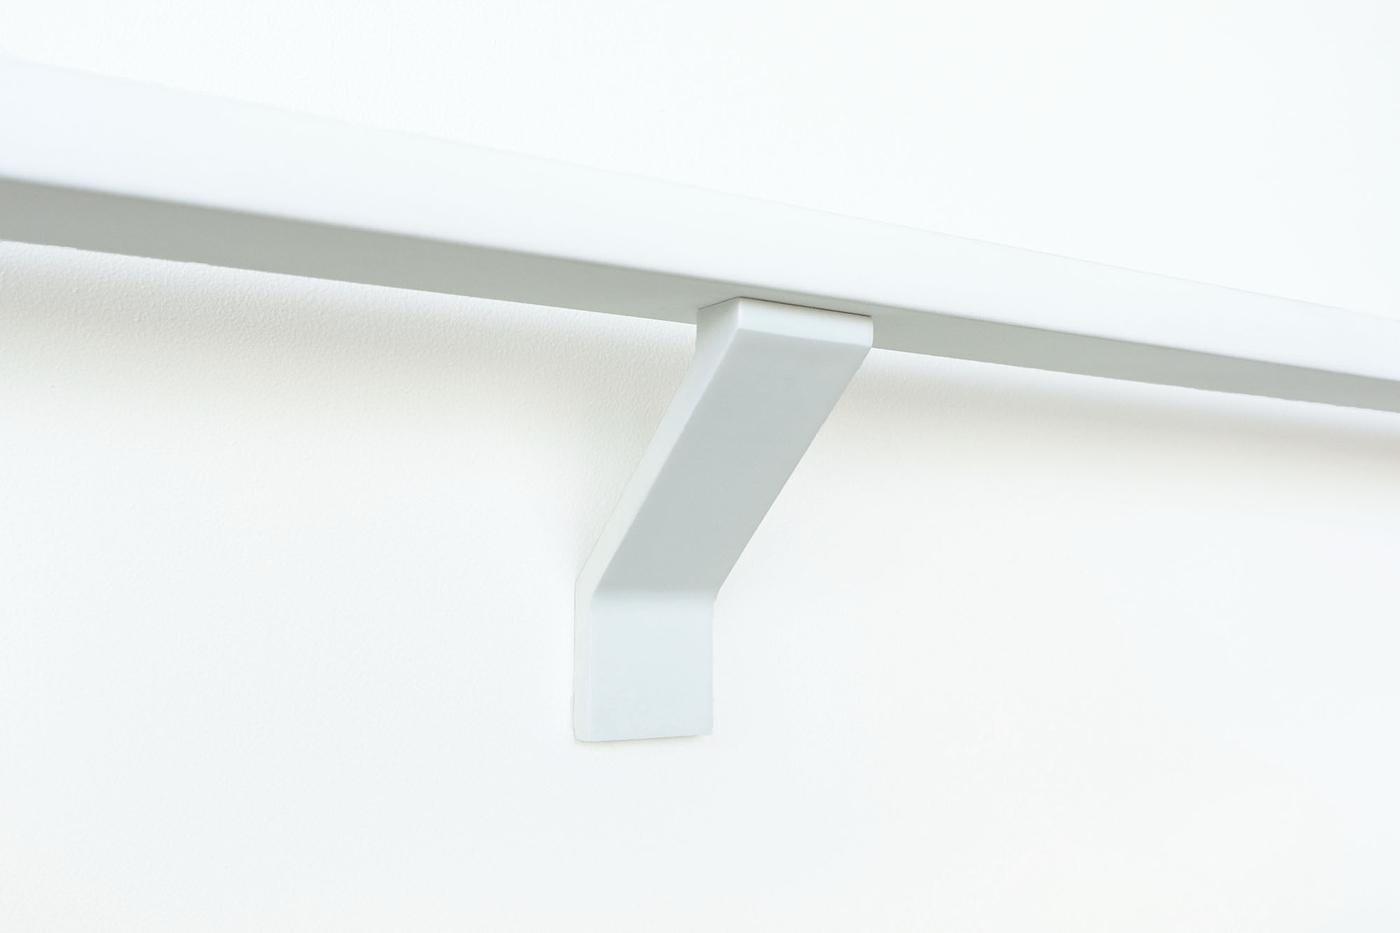 Simple-white-handrail-bracket